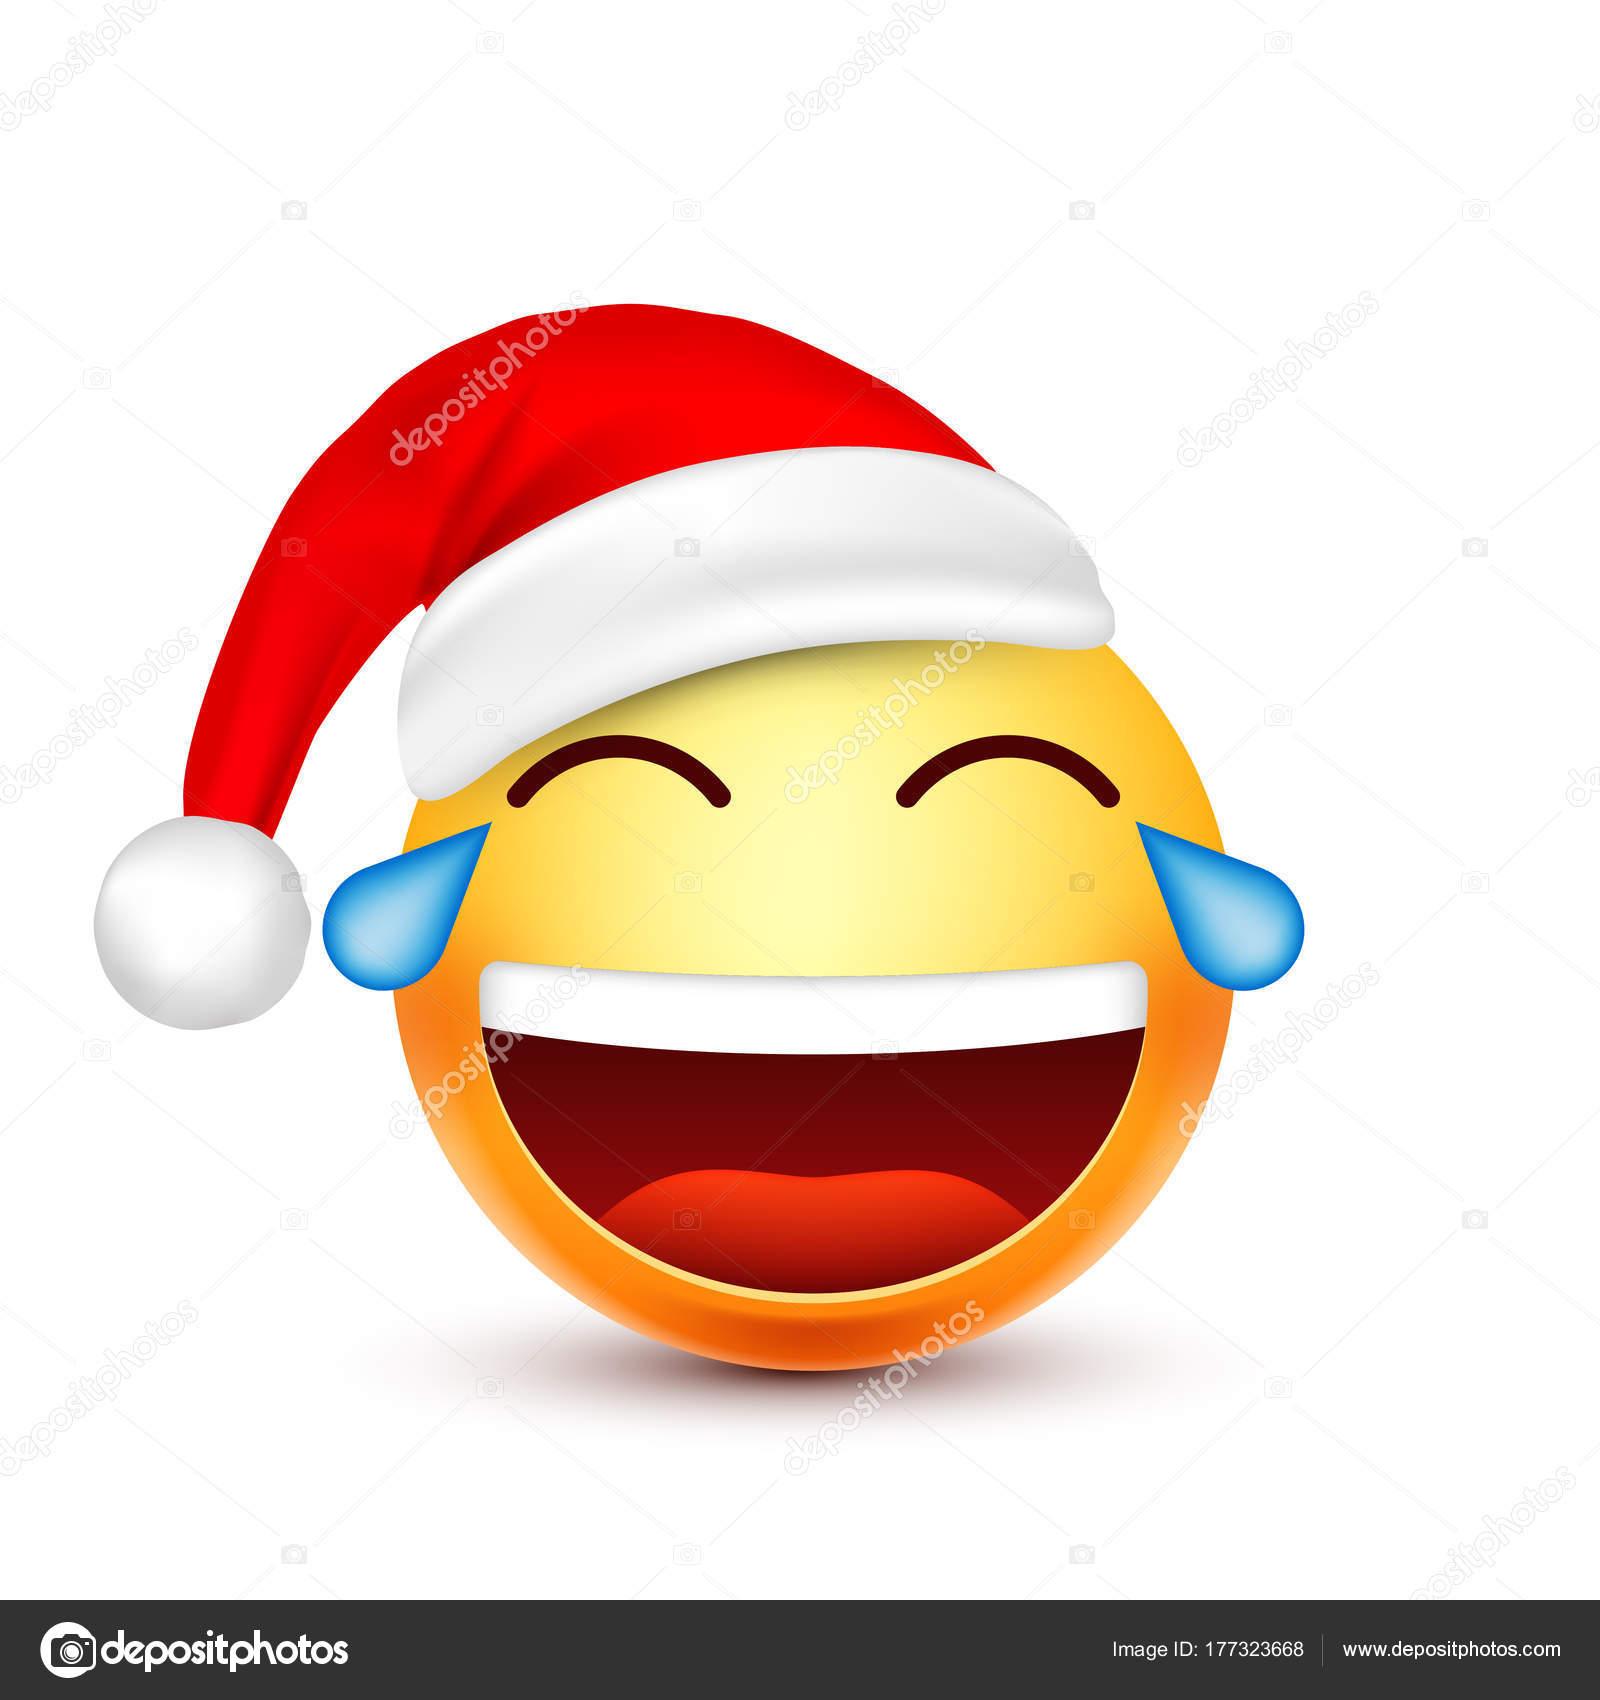 Pollici giù emoji smiley clipart k fotosearch